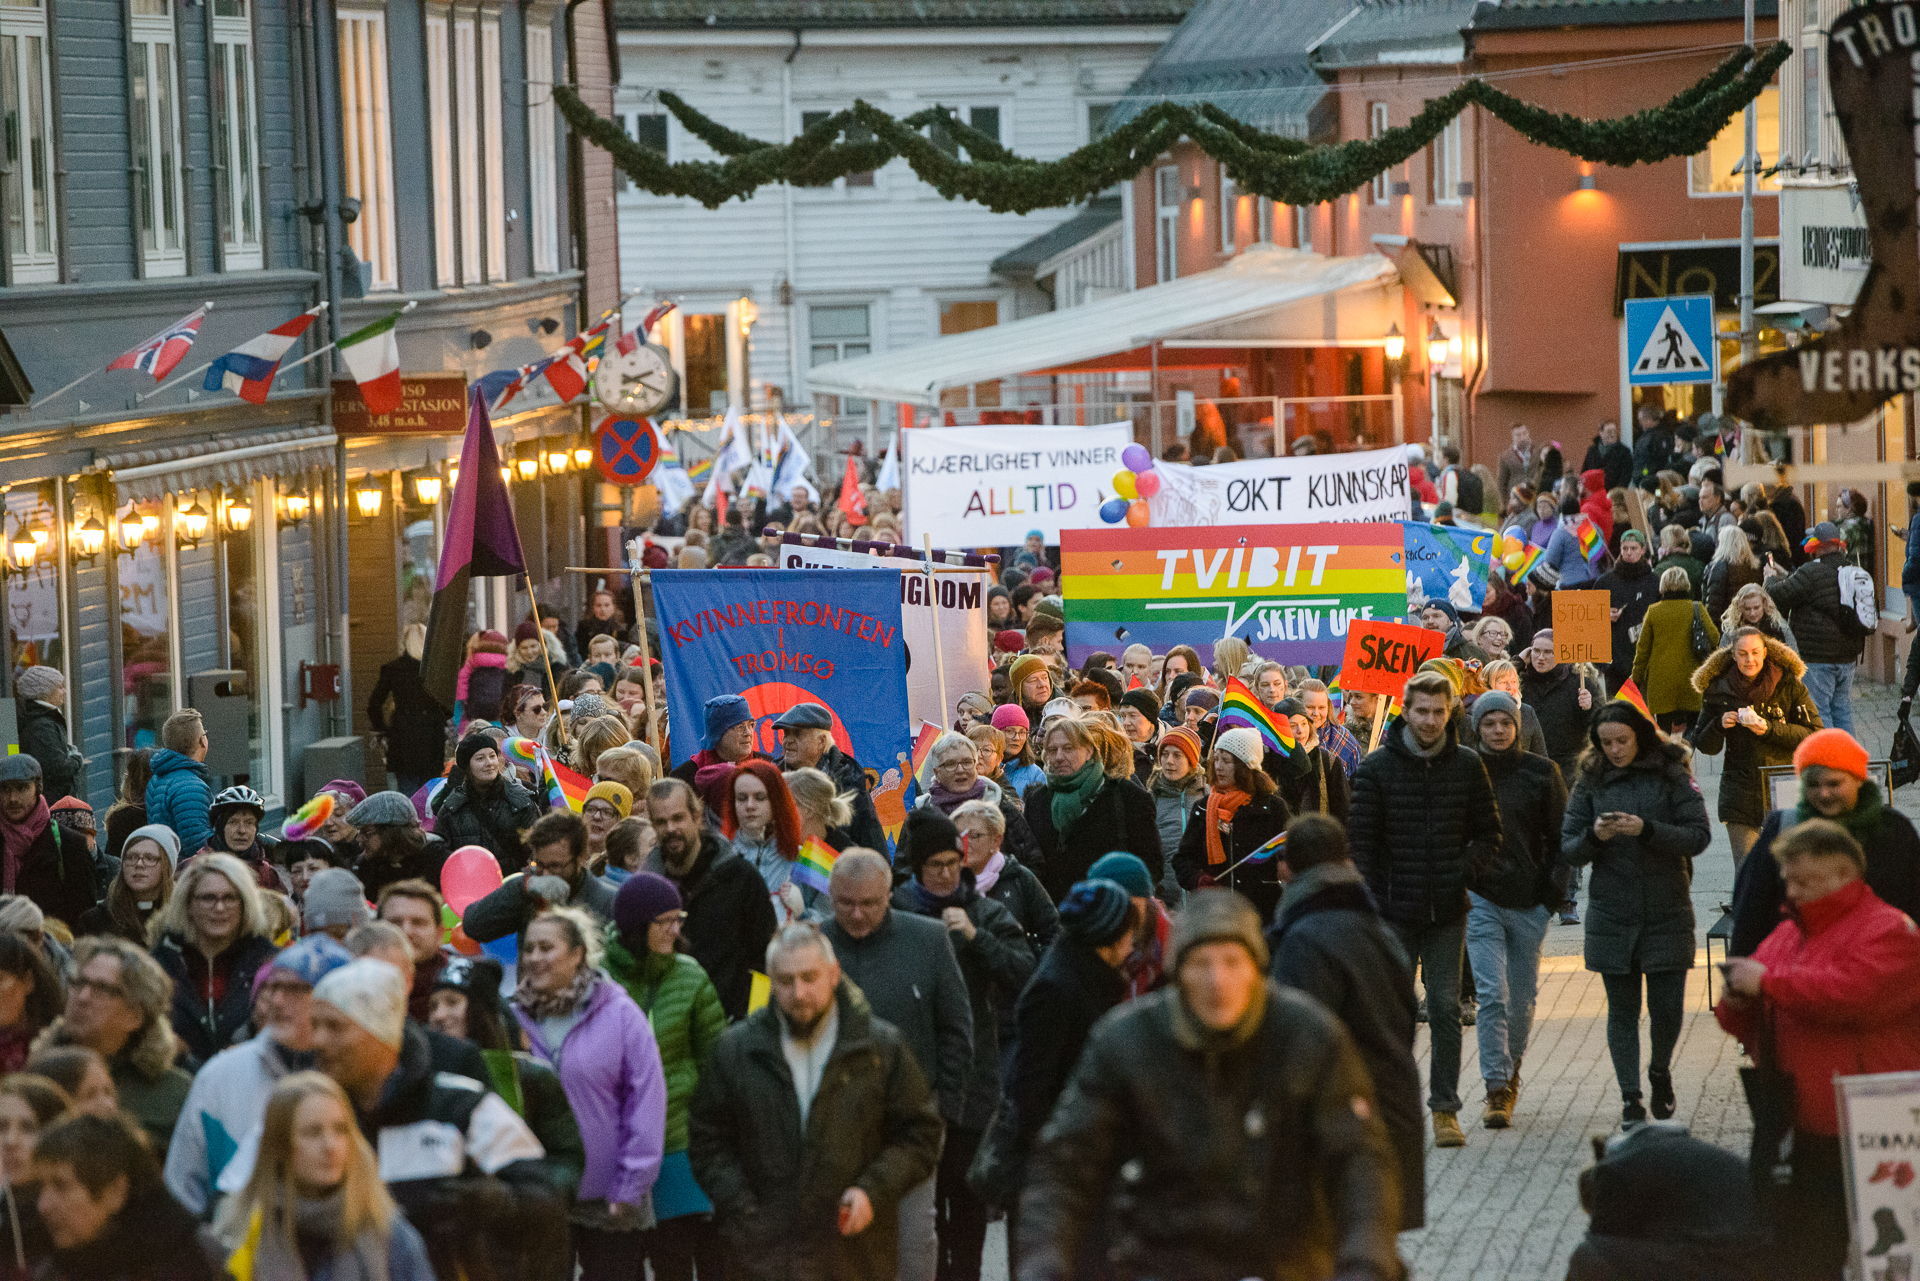 Rundt 4000 mennesker deltok i paraden. Foto: Lars Åke Andersen.